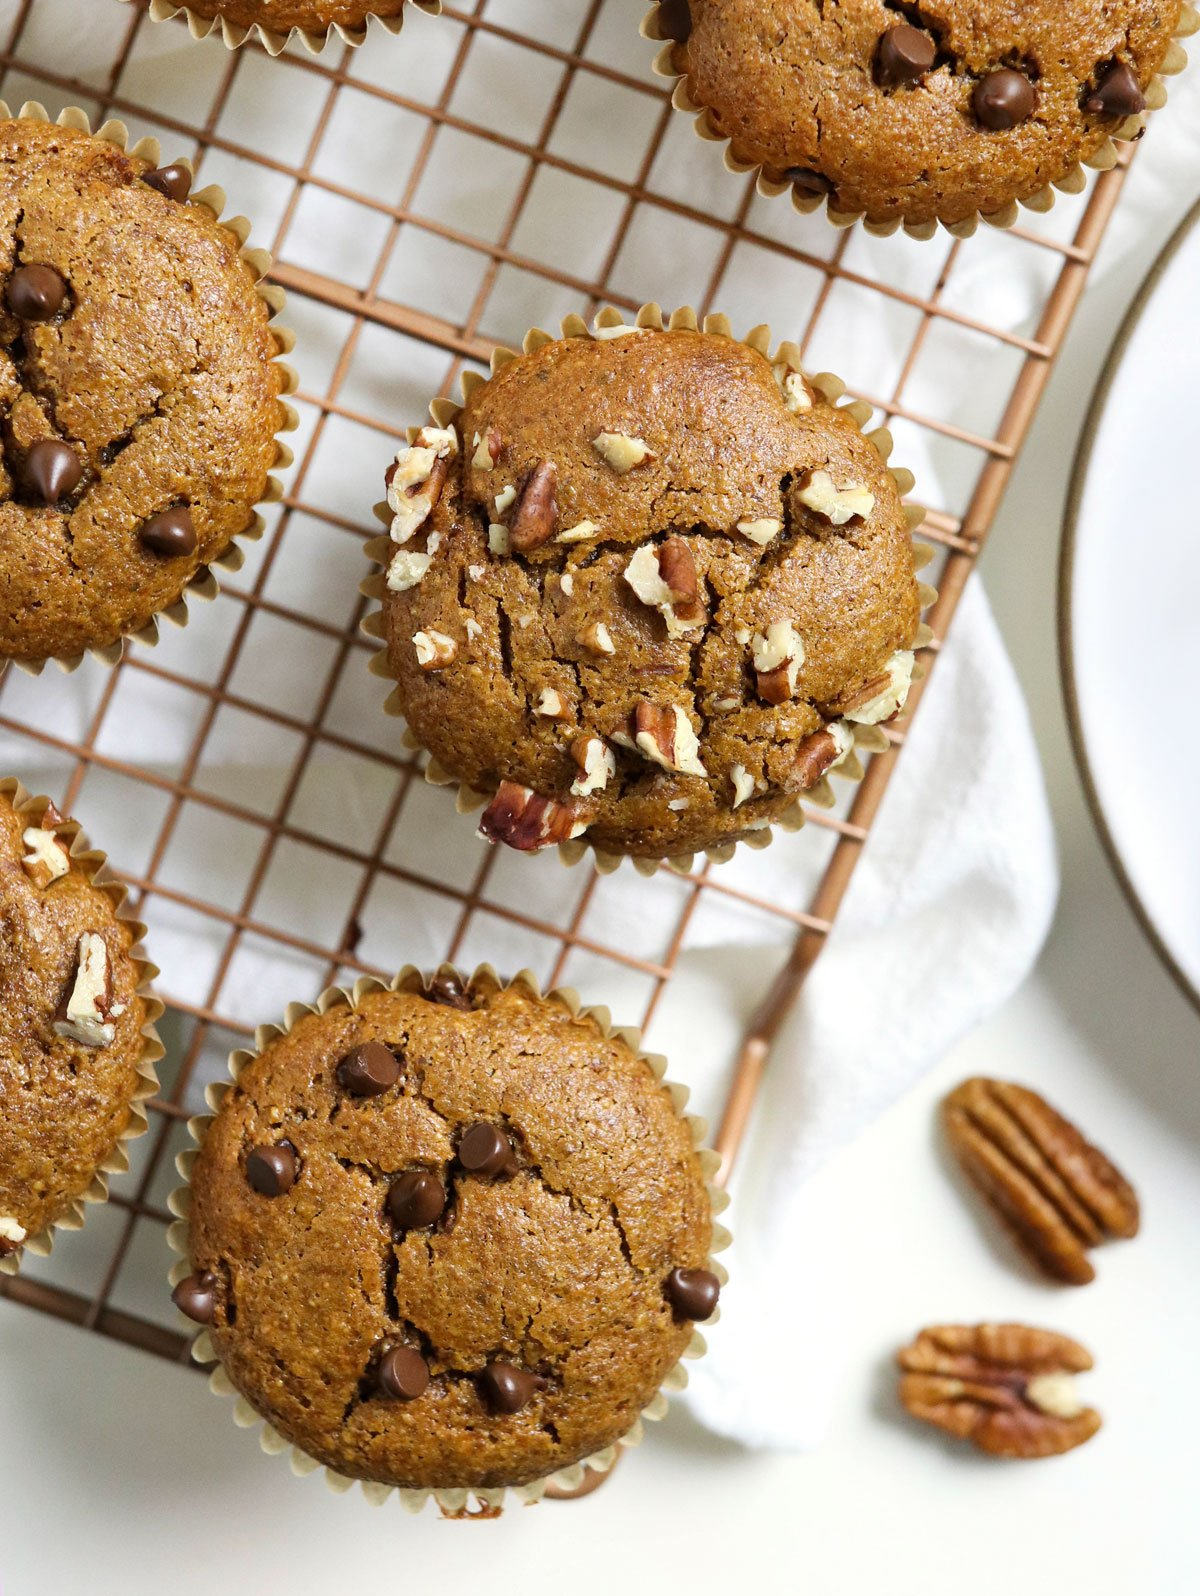 paleo pumpkin muffins on cooling rack